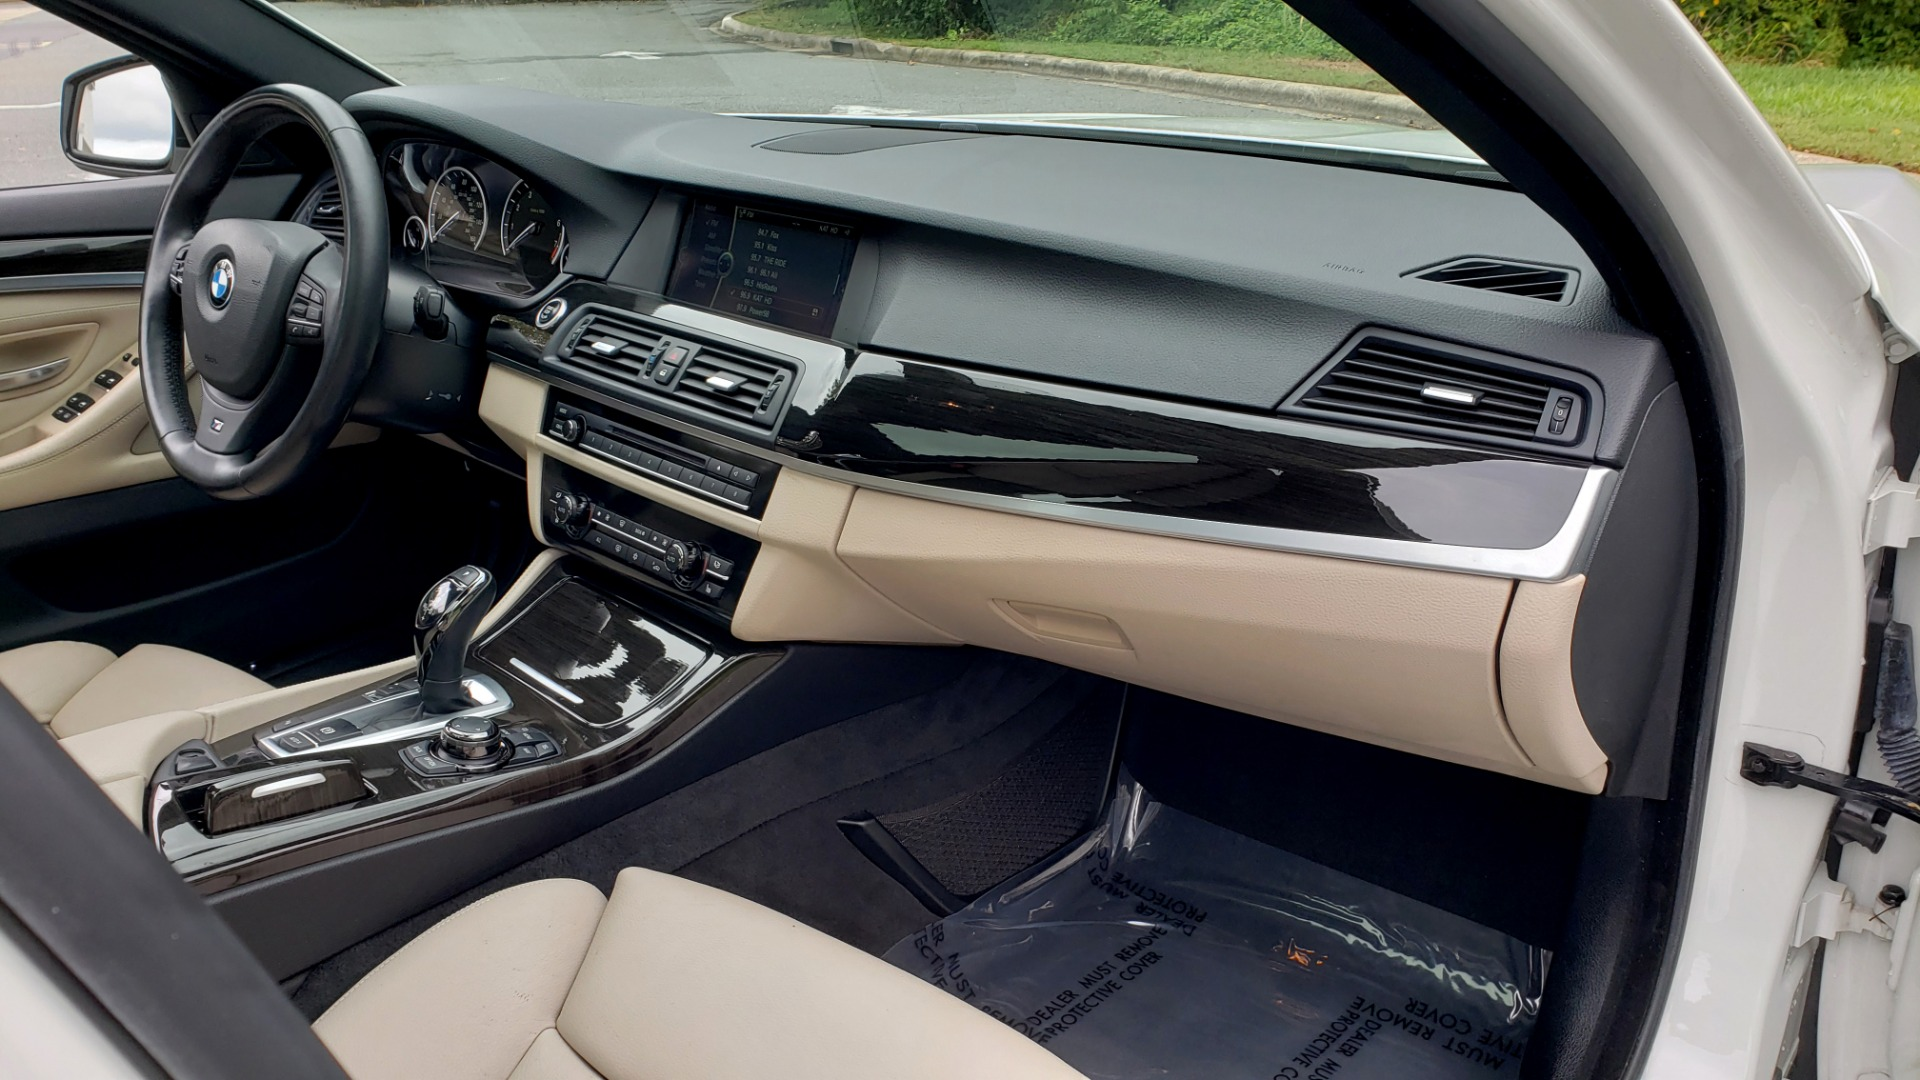 Used 2012 BMW 5 SERIES 550I M SPORT / NAV / CONV PKG / SUNROOF / PREM SND / REARVIEW for sale Sold at Formula Imports in Charlotte NC 28227 61